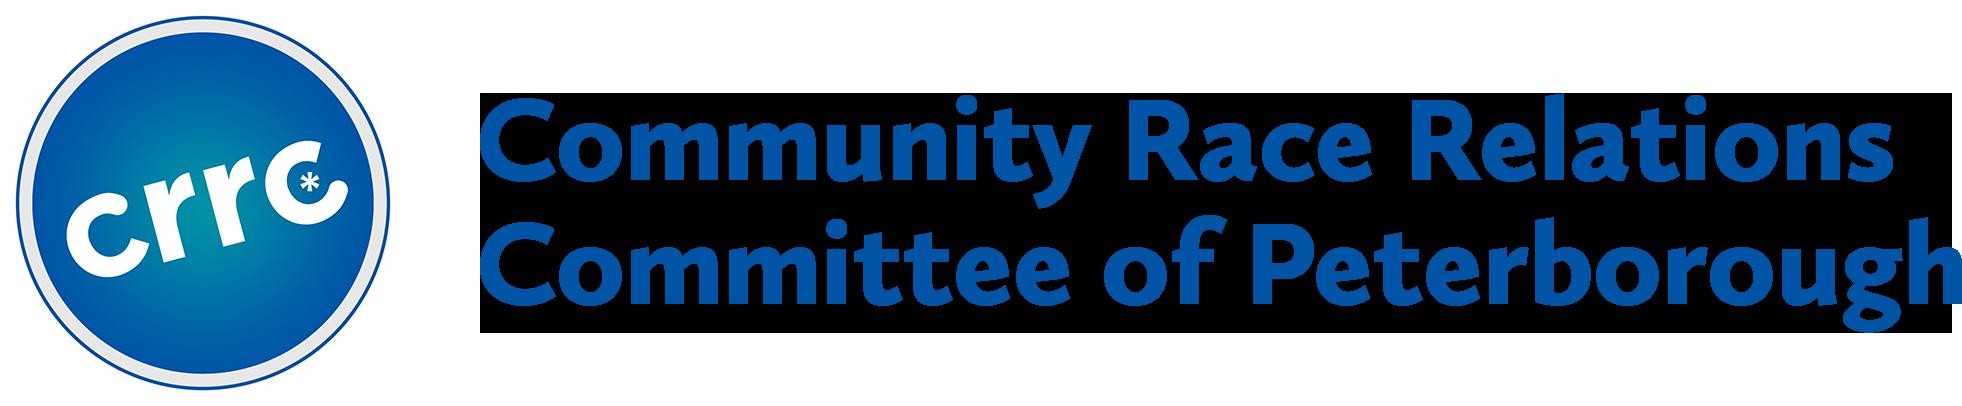 CRRC-Horizontal-Logo-2017-Update